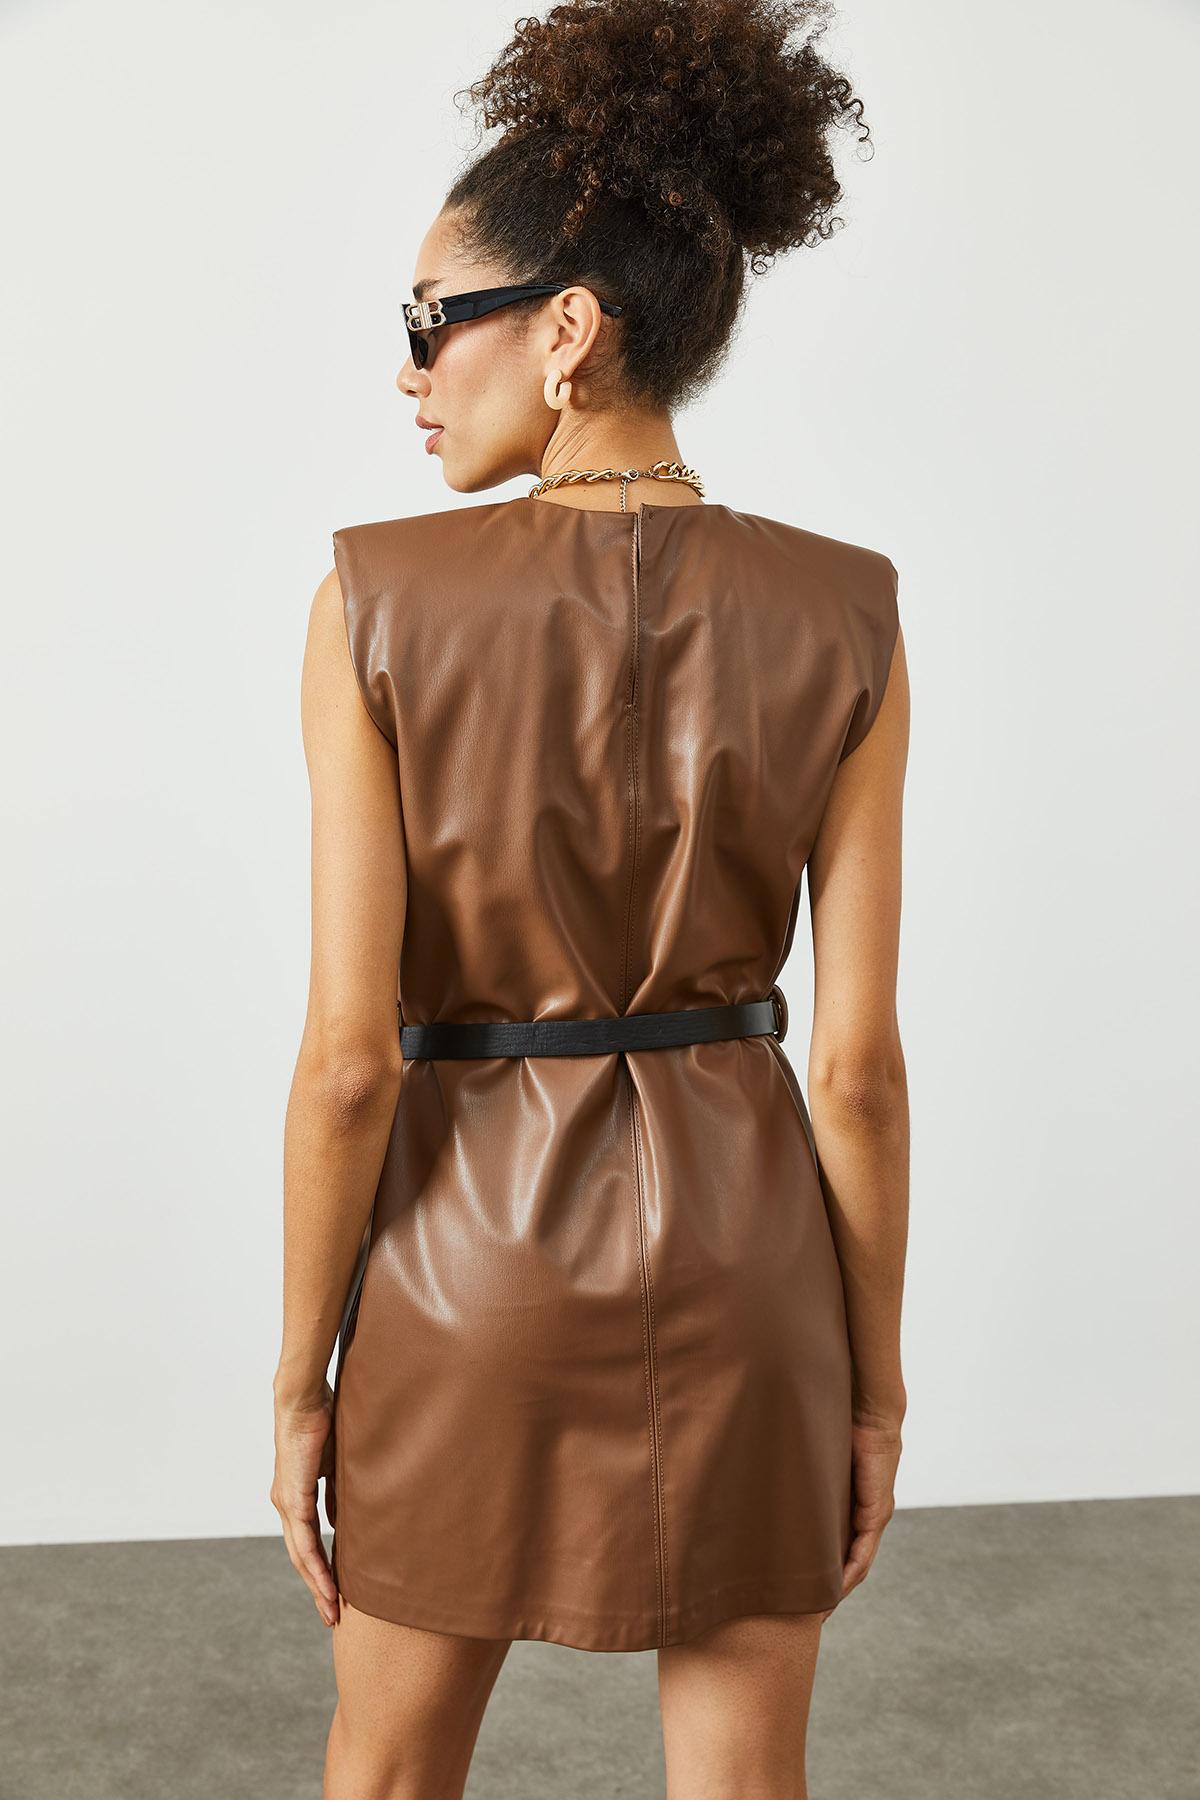 Kahverengi Vatkalı & Kemerli Deri Elbise 2KXK6-45393-18